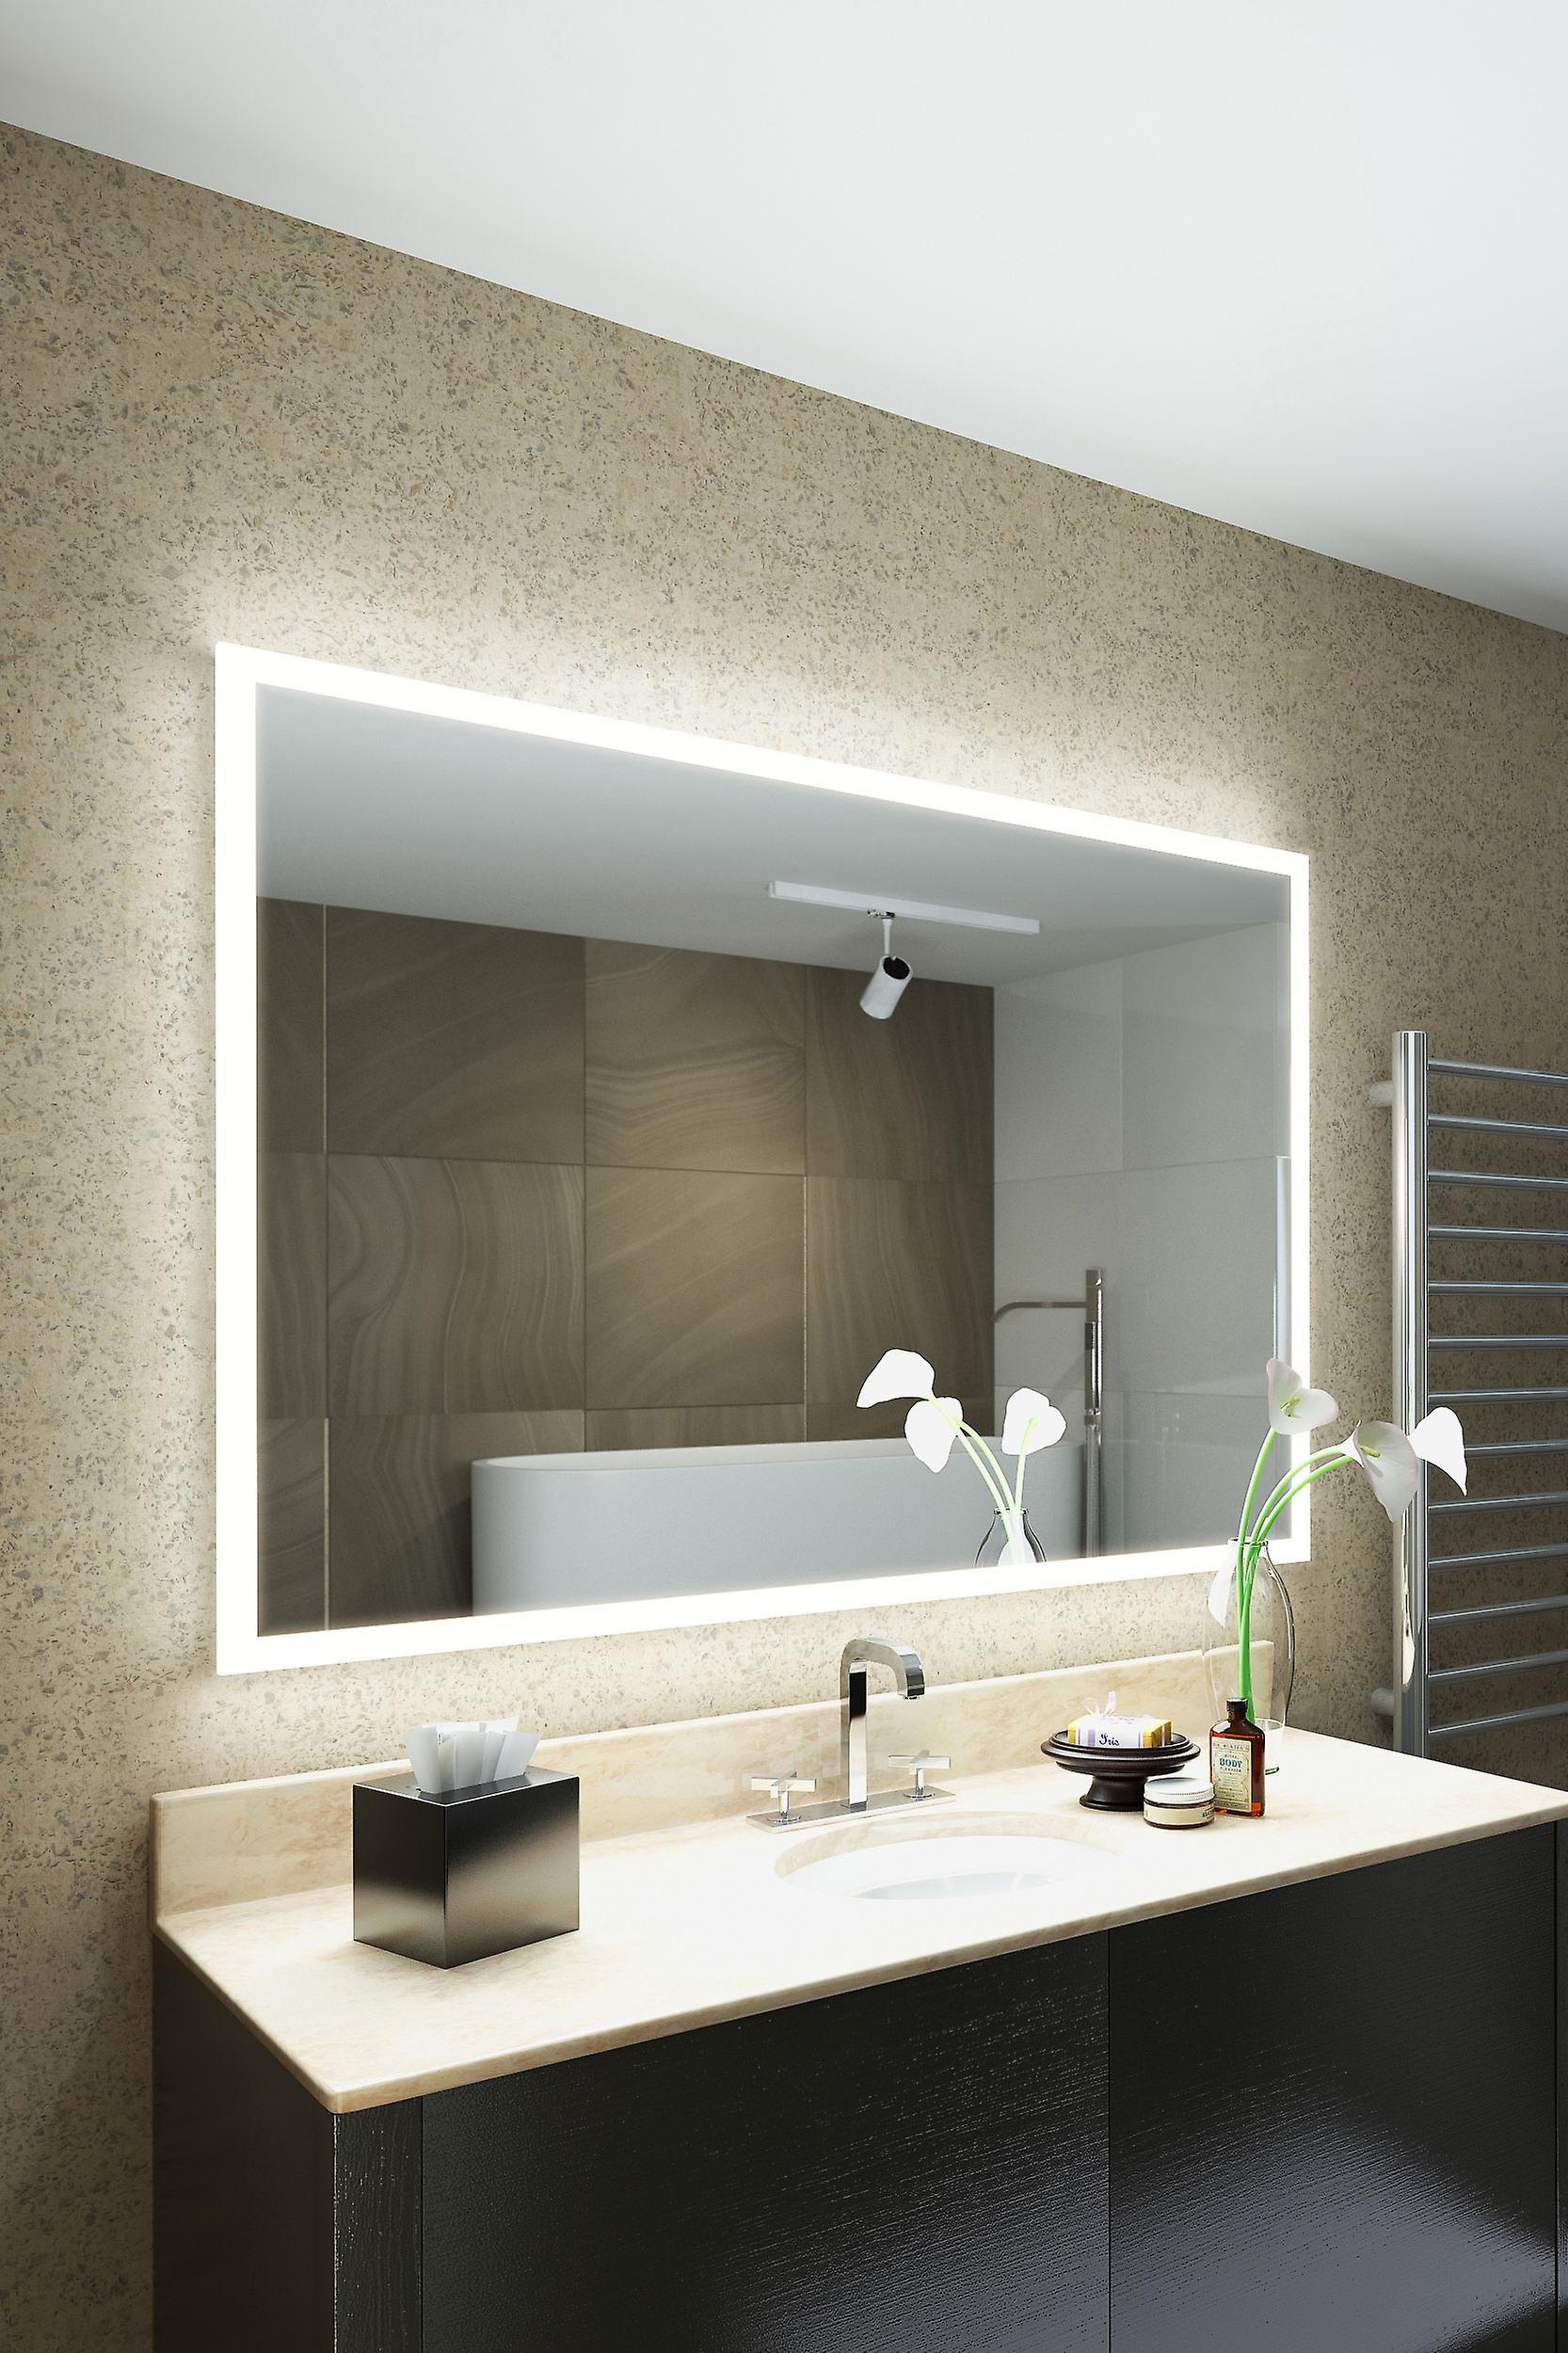 RGB Audio Shaver Mirror with bleutooth Demist Sensor K8402hrgbaud